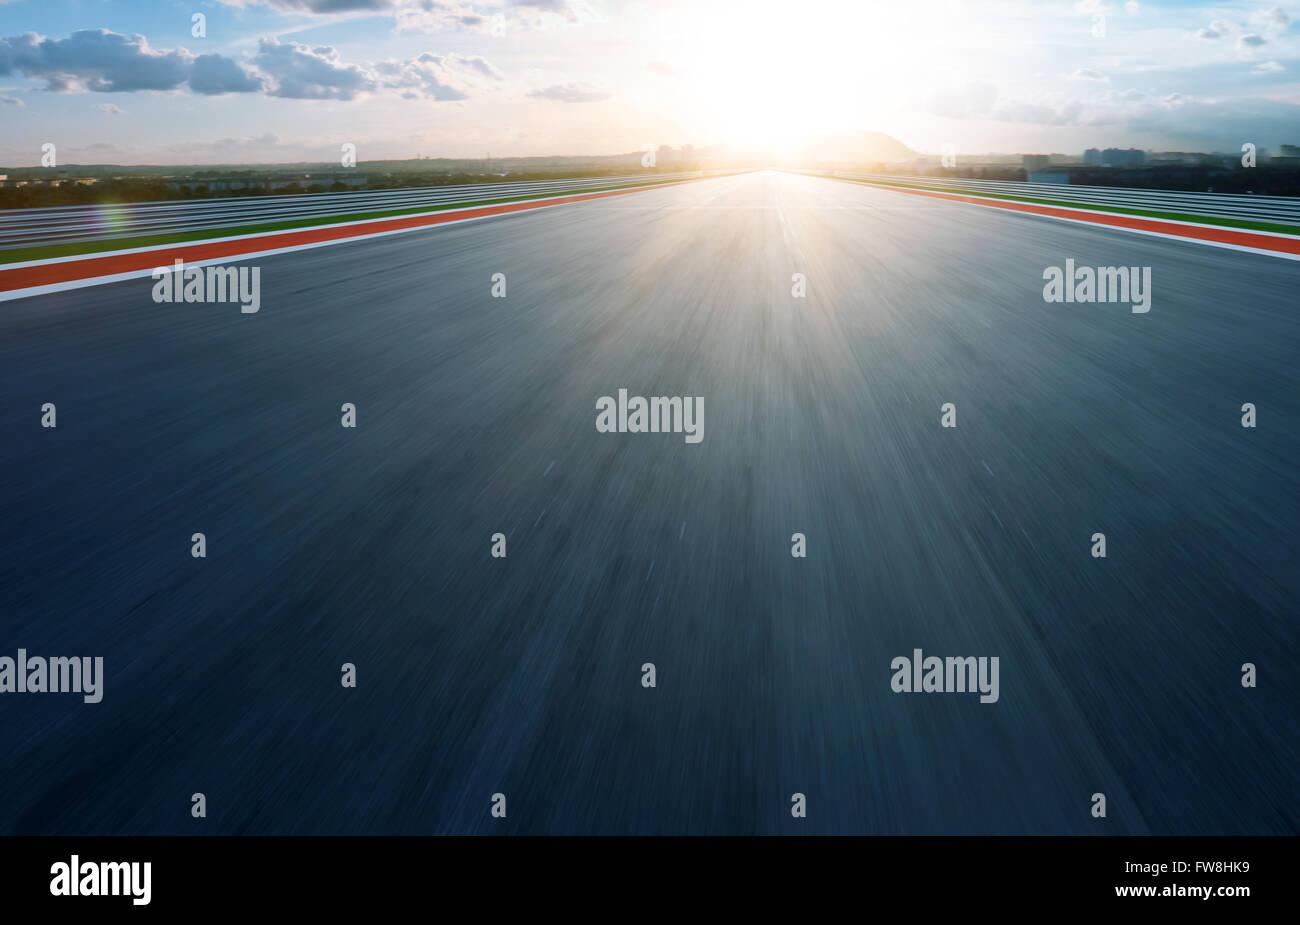 Movimiento de carreras borrosa,mañana Imagen De Stock